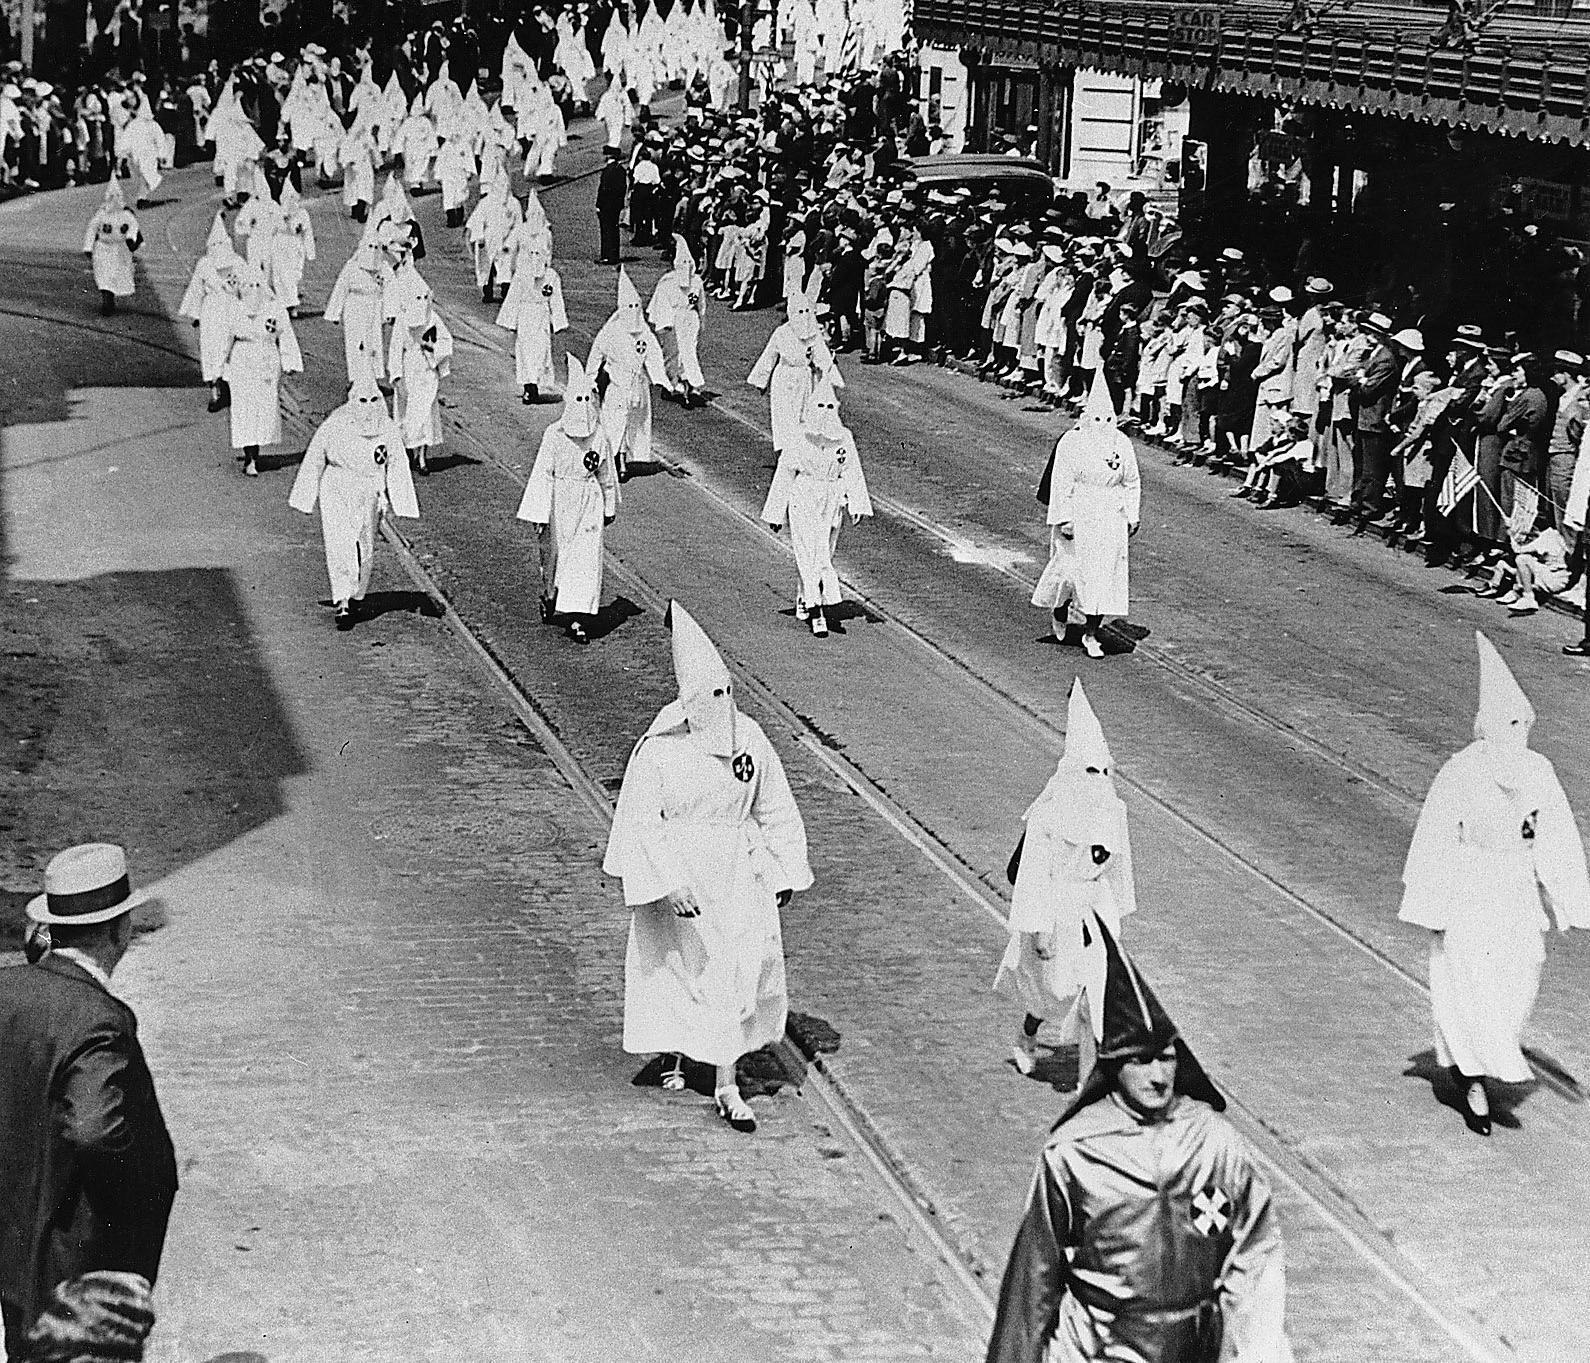 Hundratals kvinnor i Ku klux klan-dräkter deltar i en Memorial Day-parad i Atlanta, Georgia, den 26 april 1936.